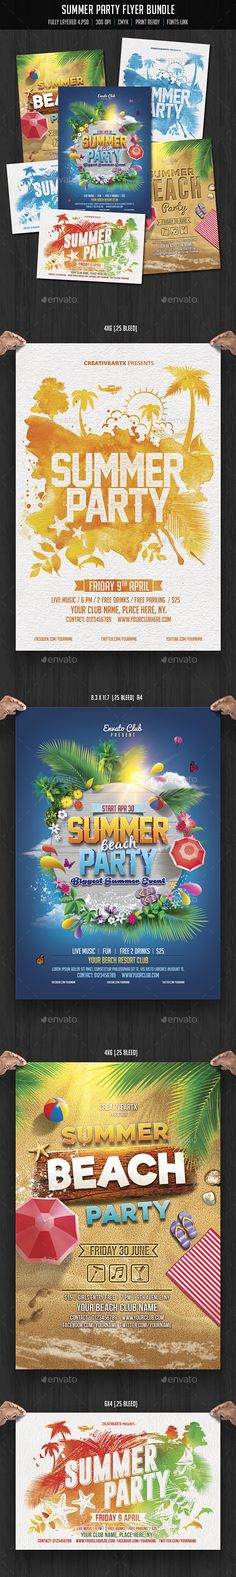 Summer Party Flyer Templates PSD Bundle. Download here: http://graphicriver.net/item/summer-party-flyer-bundle/15866812?ref=ksioks